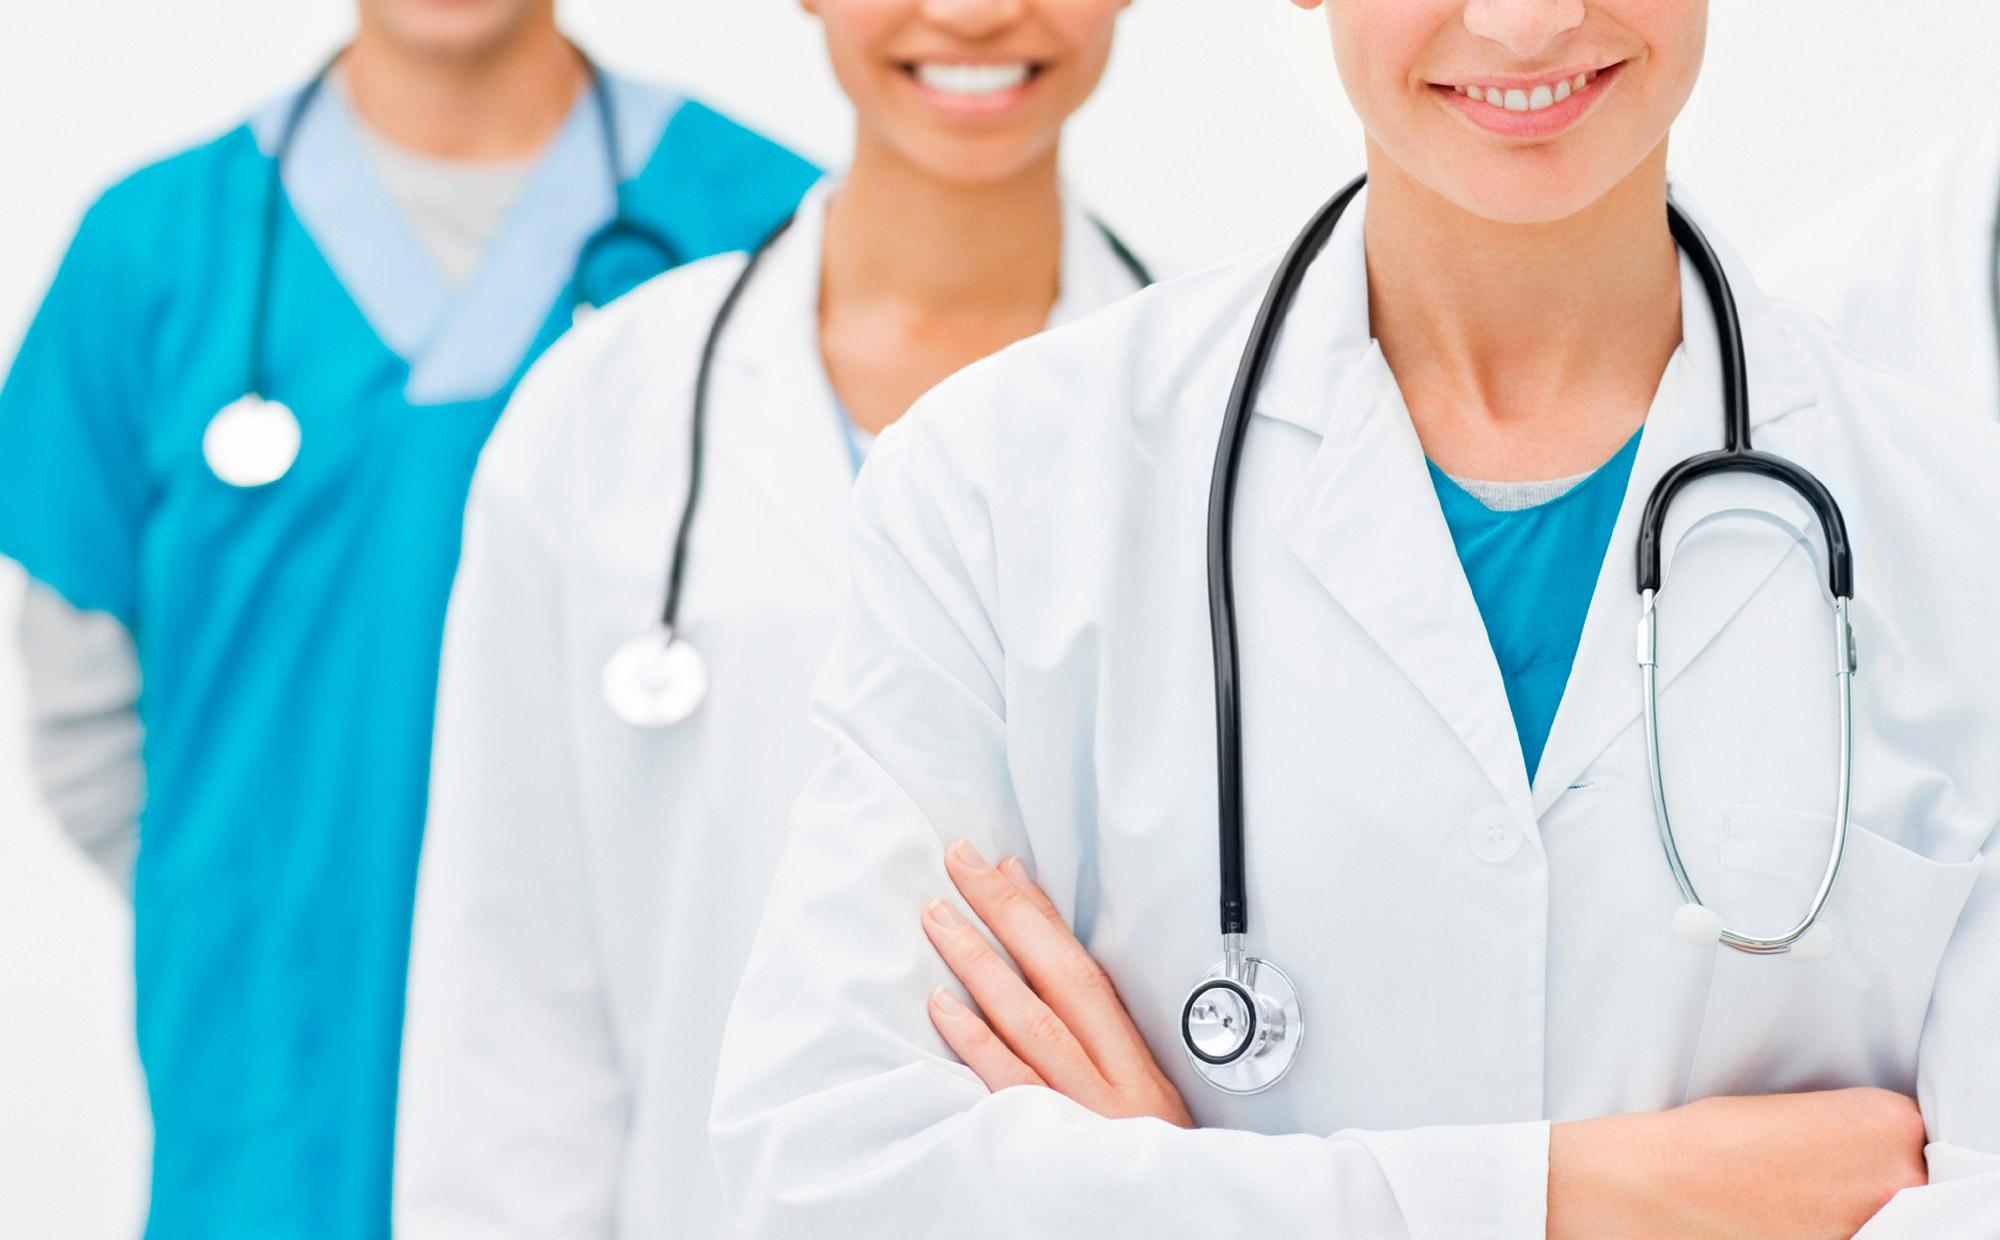 https://brasiltelemedicina.com.br/wp-content/uploads/2016/07/heart-health.jpg